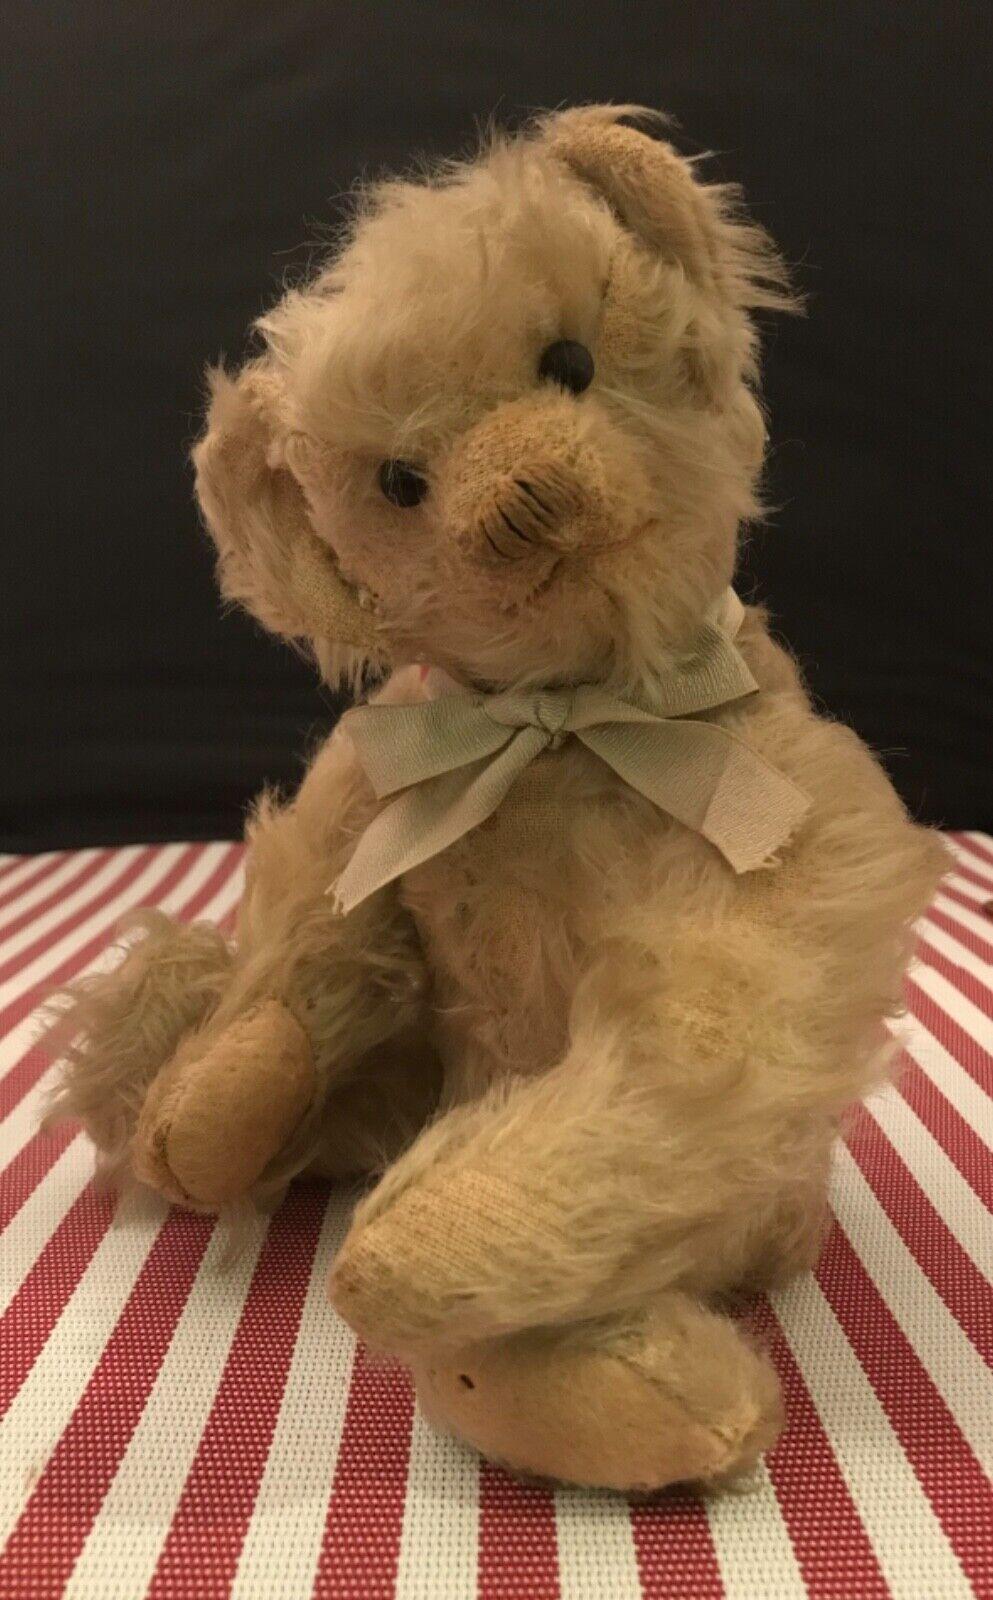 Wonderful Early Antique Teddy Bear With Huge Ears LOOK - $32.00